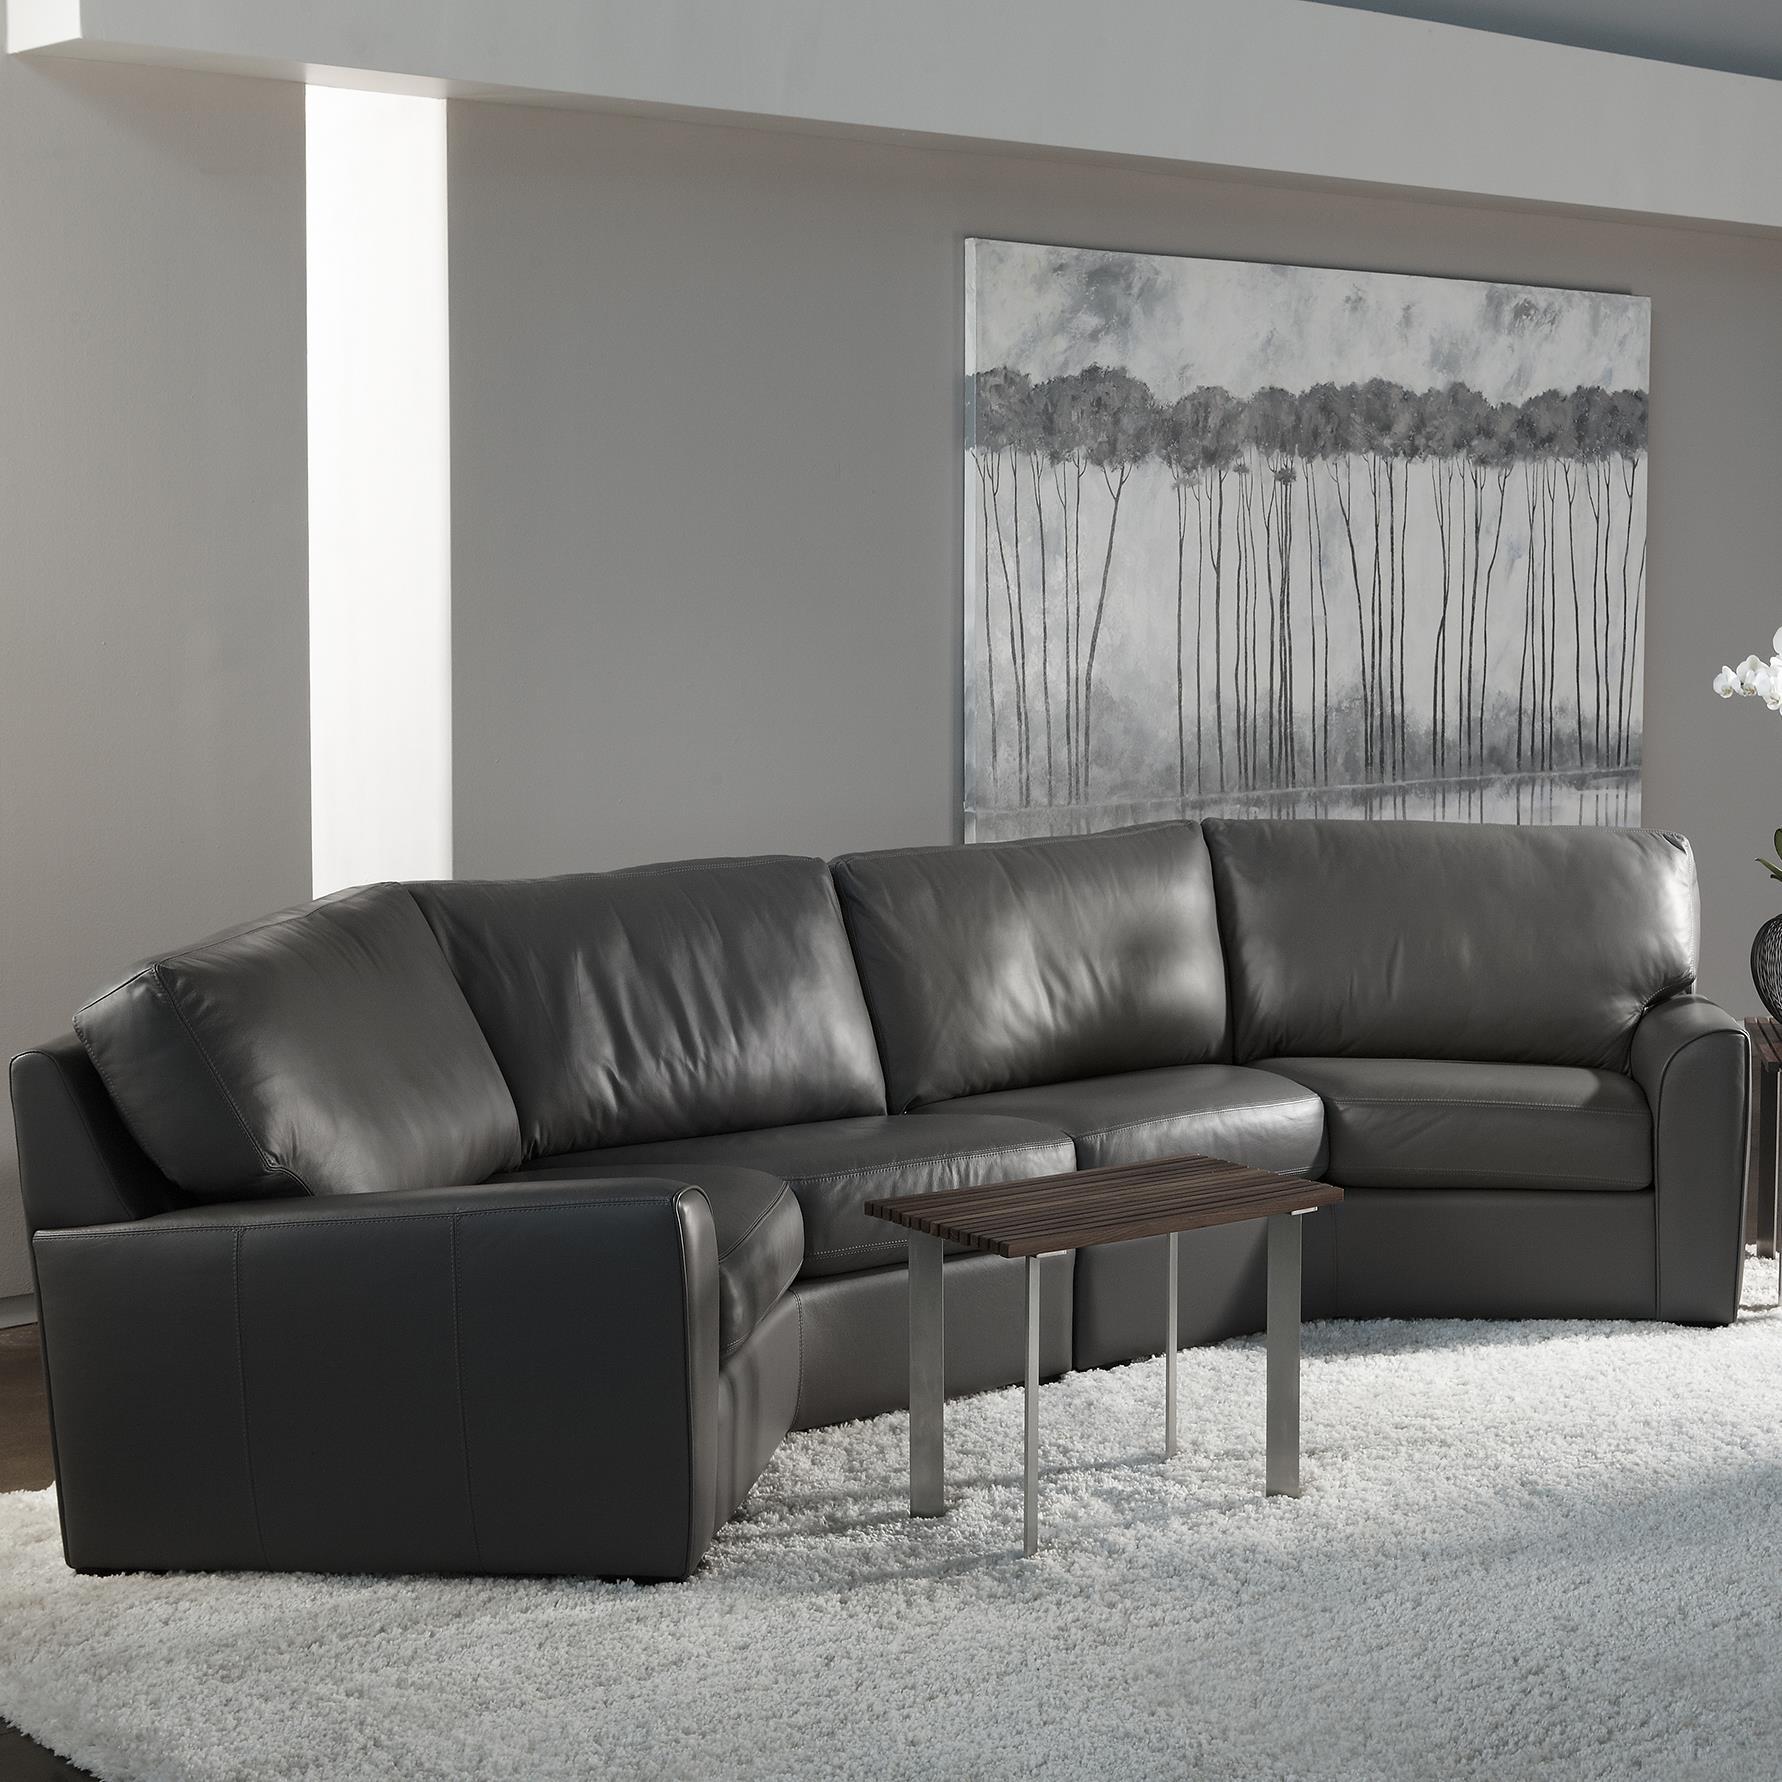 american leather kaden casual wedge sectional sofa sprintz rh sprintz com Small Corner Sectional Sofas curved wedge sectional sofa